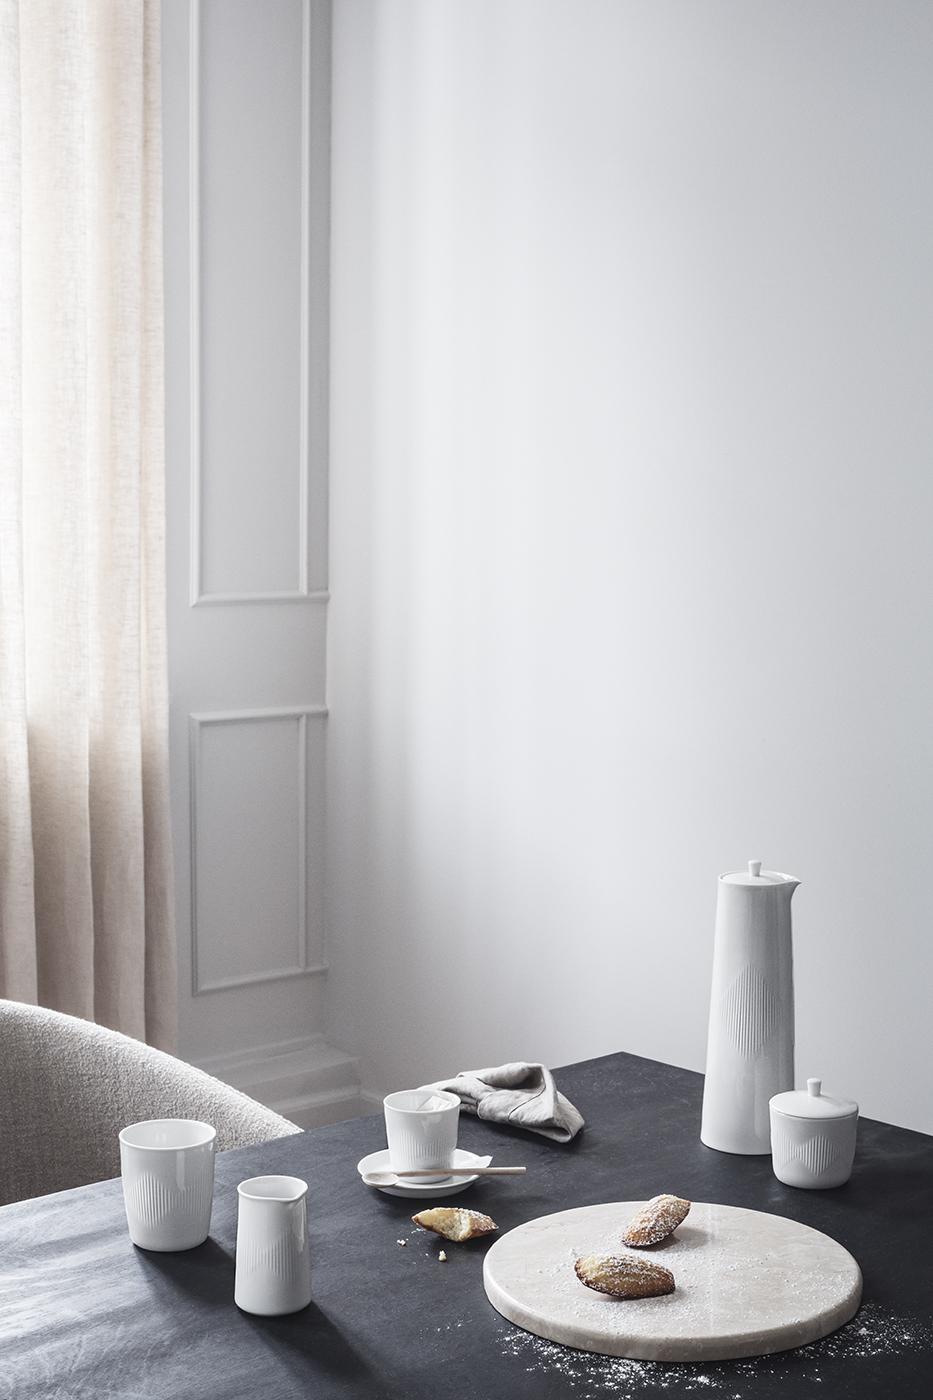 Lyngby Porcelain 03.jpg